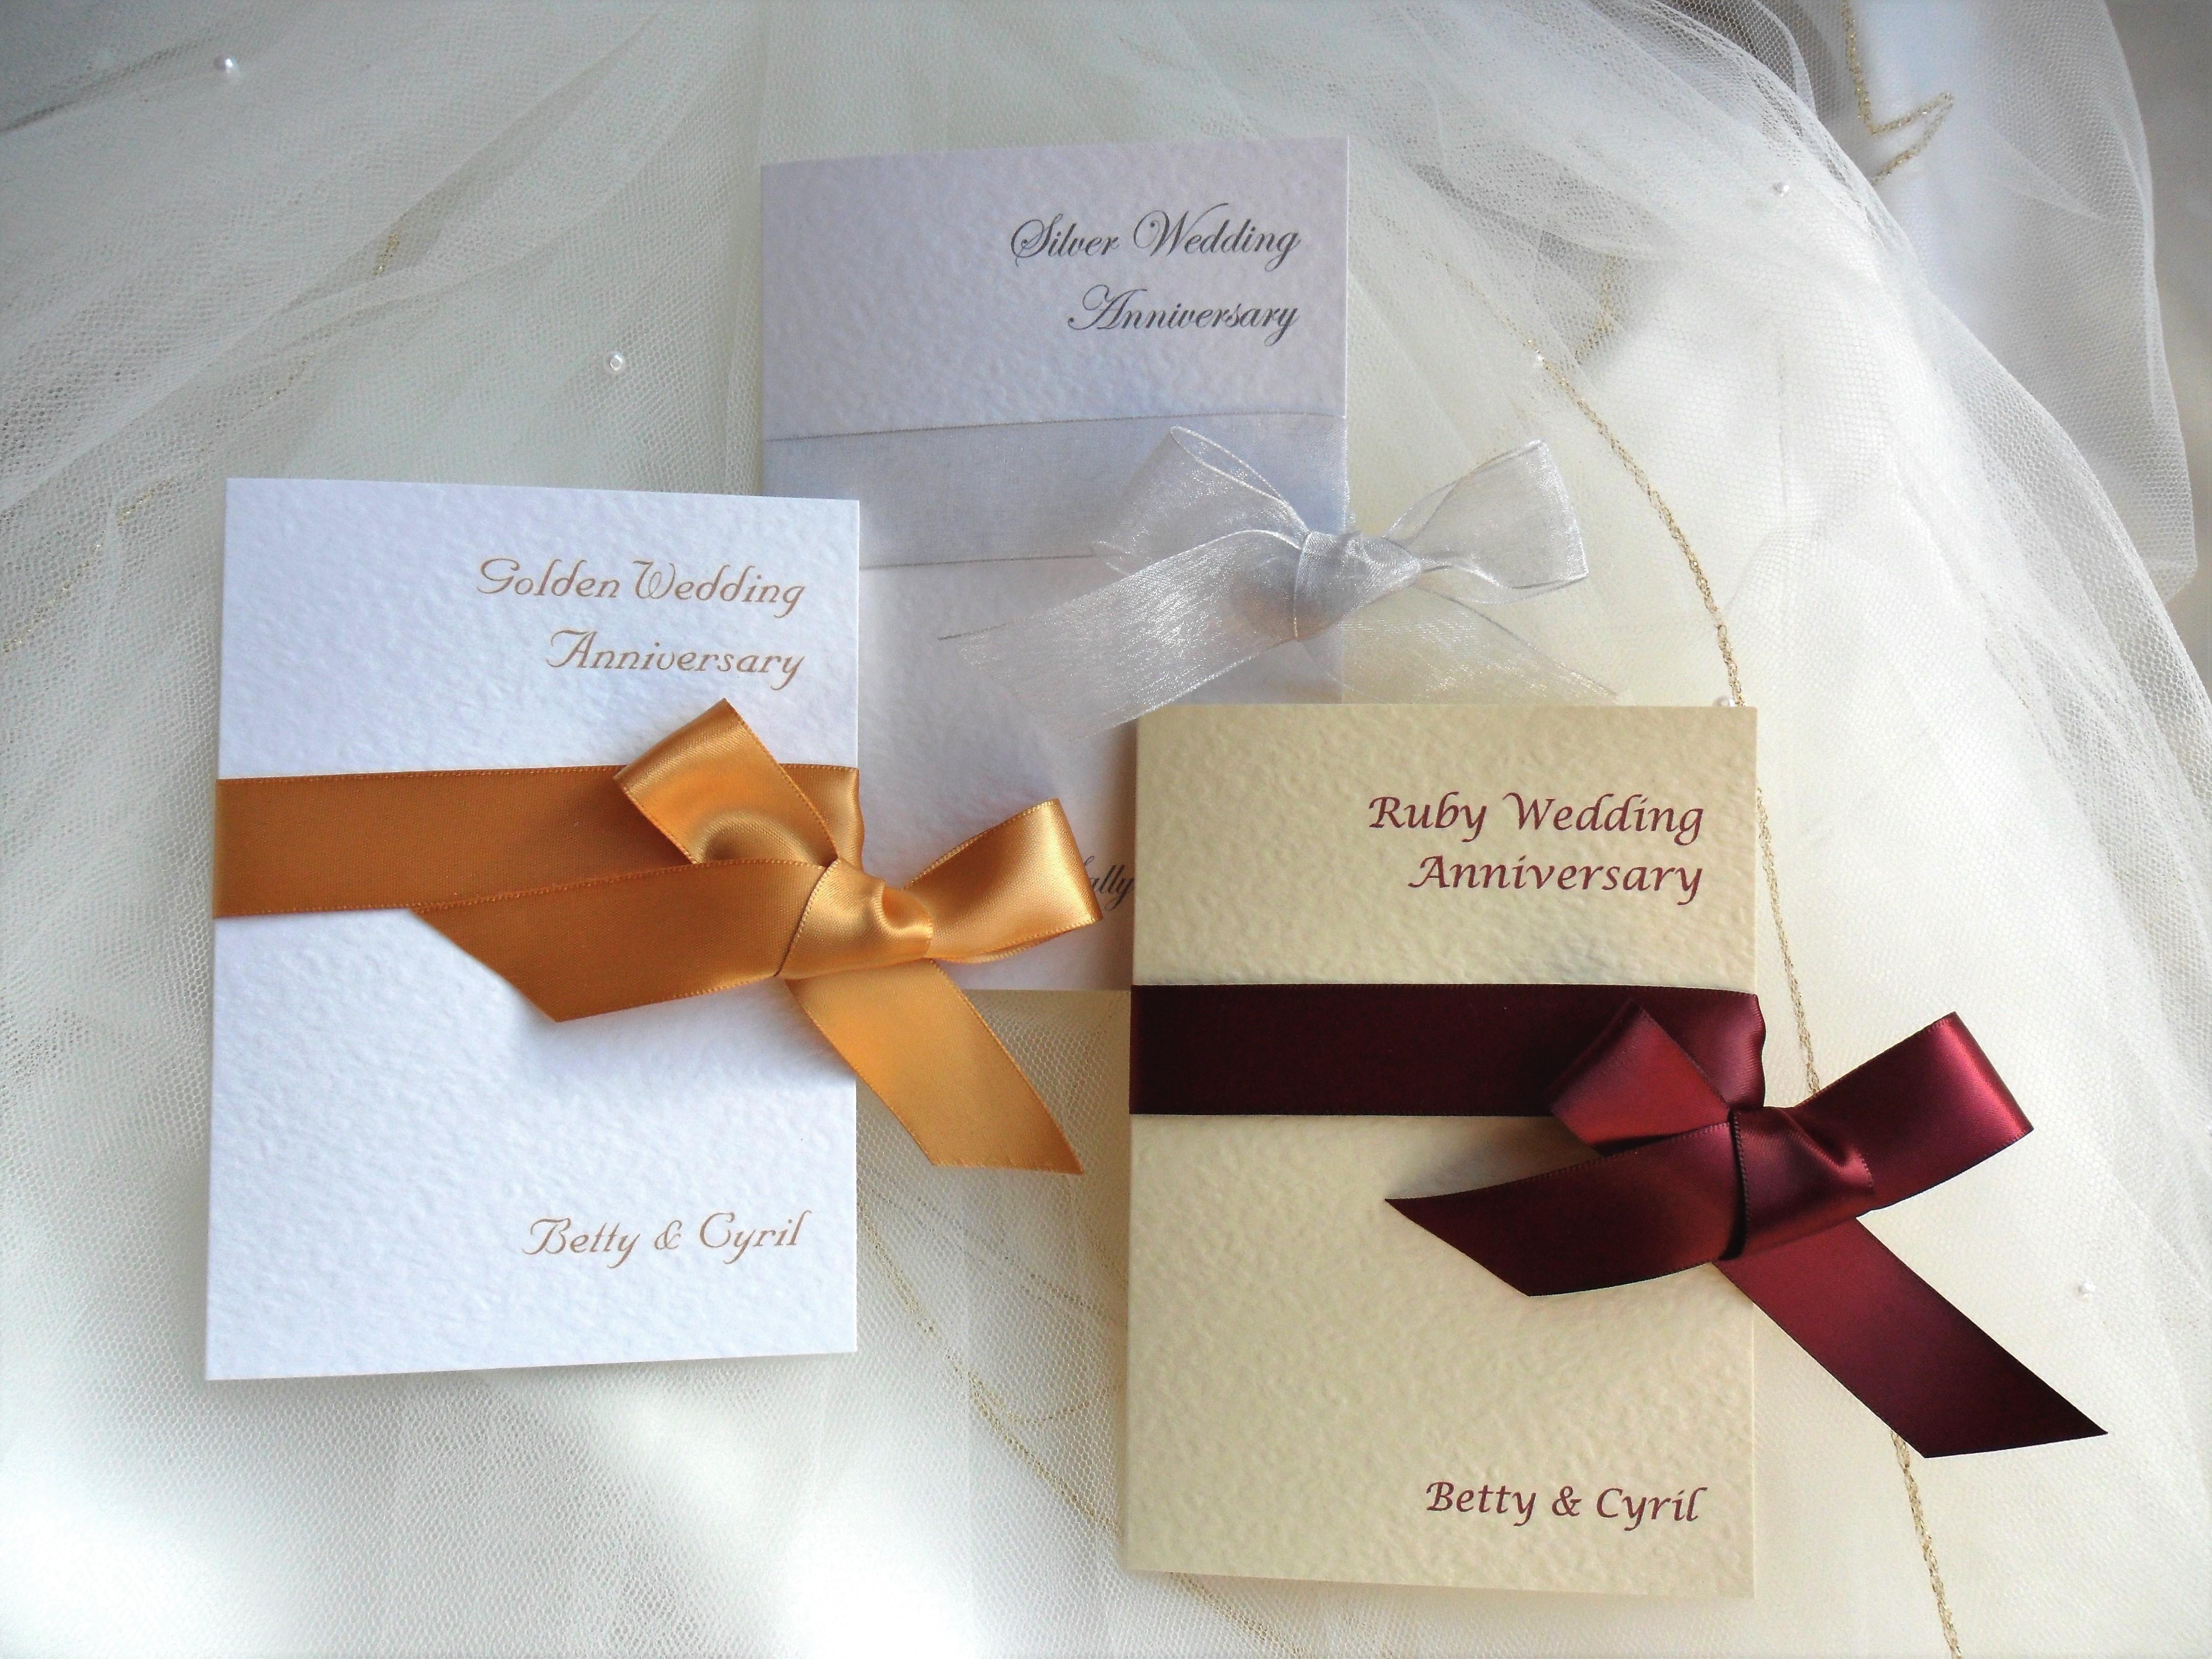 10th Wedding Anniversary Invitations: Wrap Ribbon Wedding Anniversary Invitations £1.25